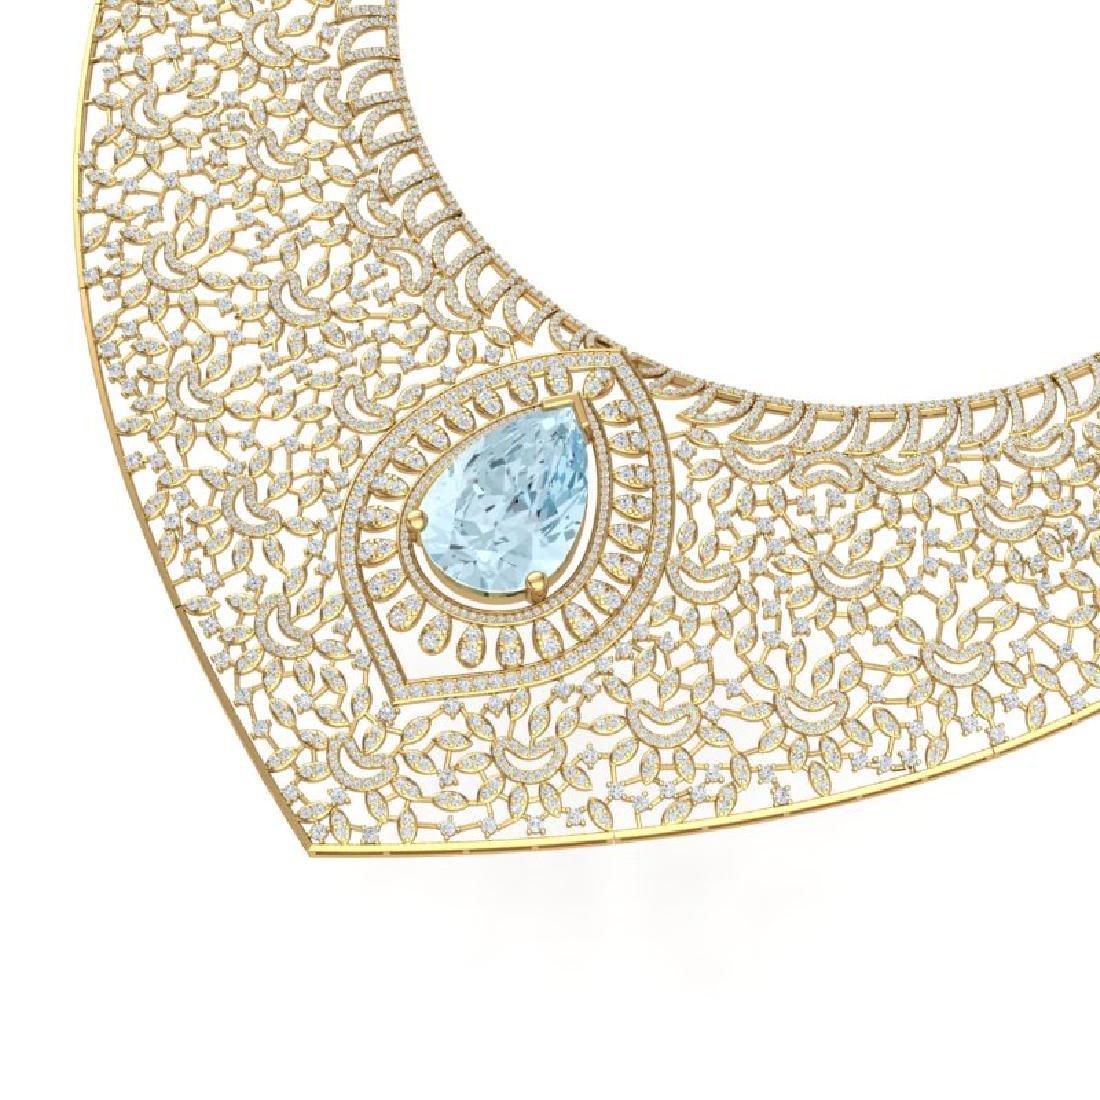 63.27 CTW Royalty Sky Topaz & VS Diamond Necklace 18K